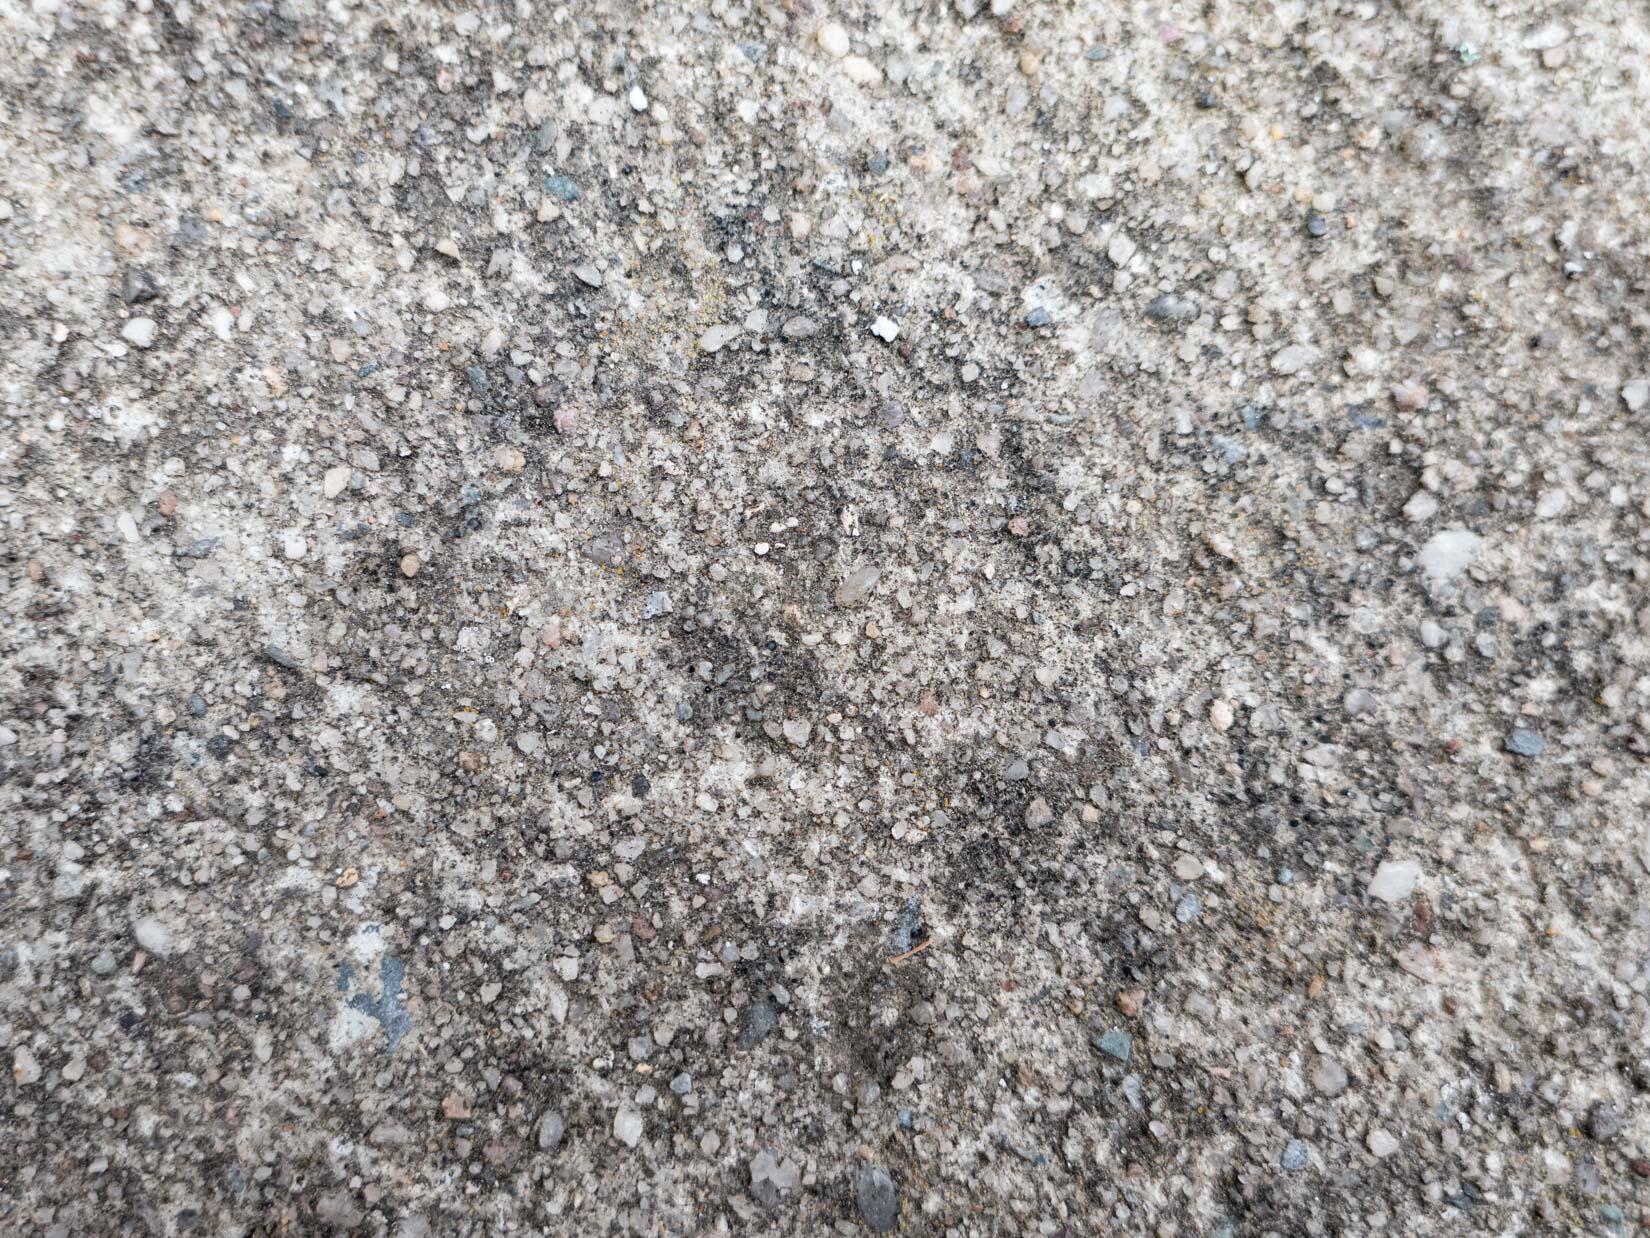 Rocks and Concrete